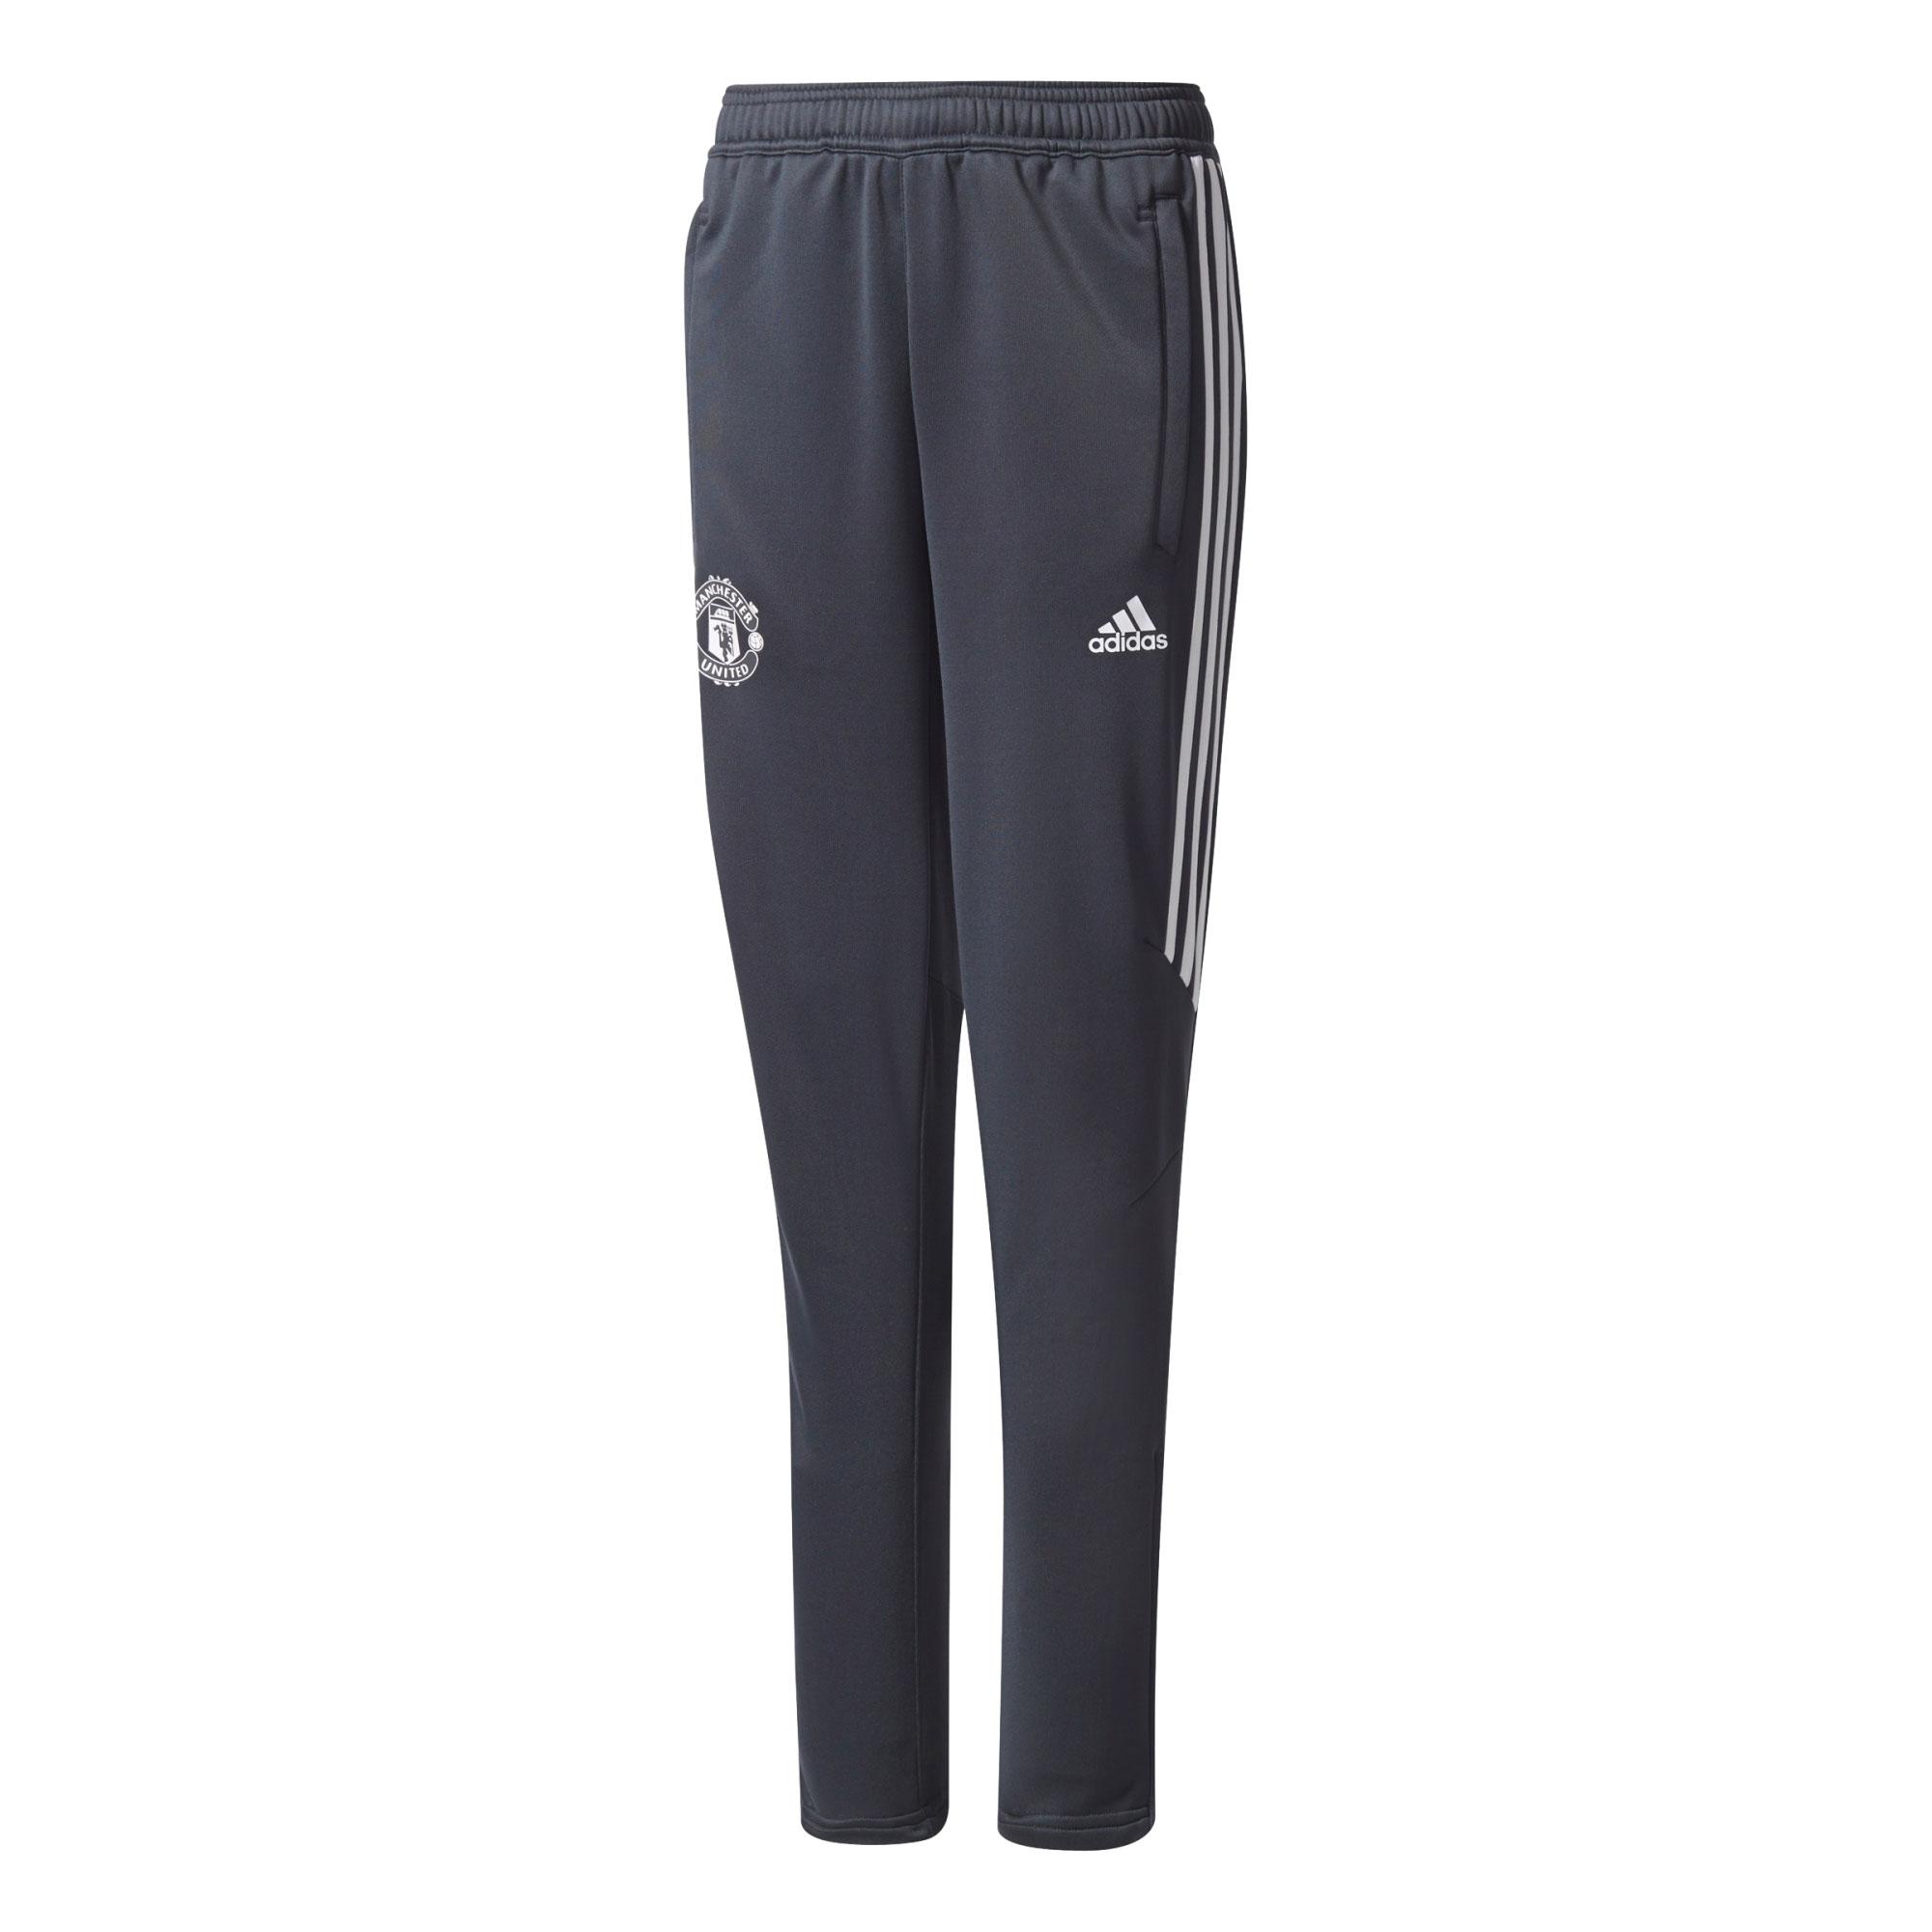 Manchester United Training Pant - Dark Grey - Kids